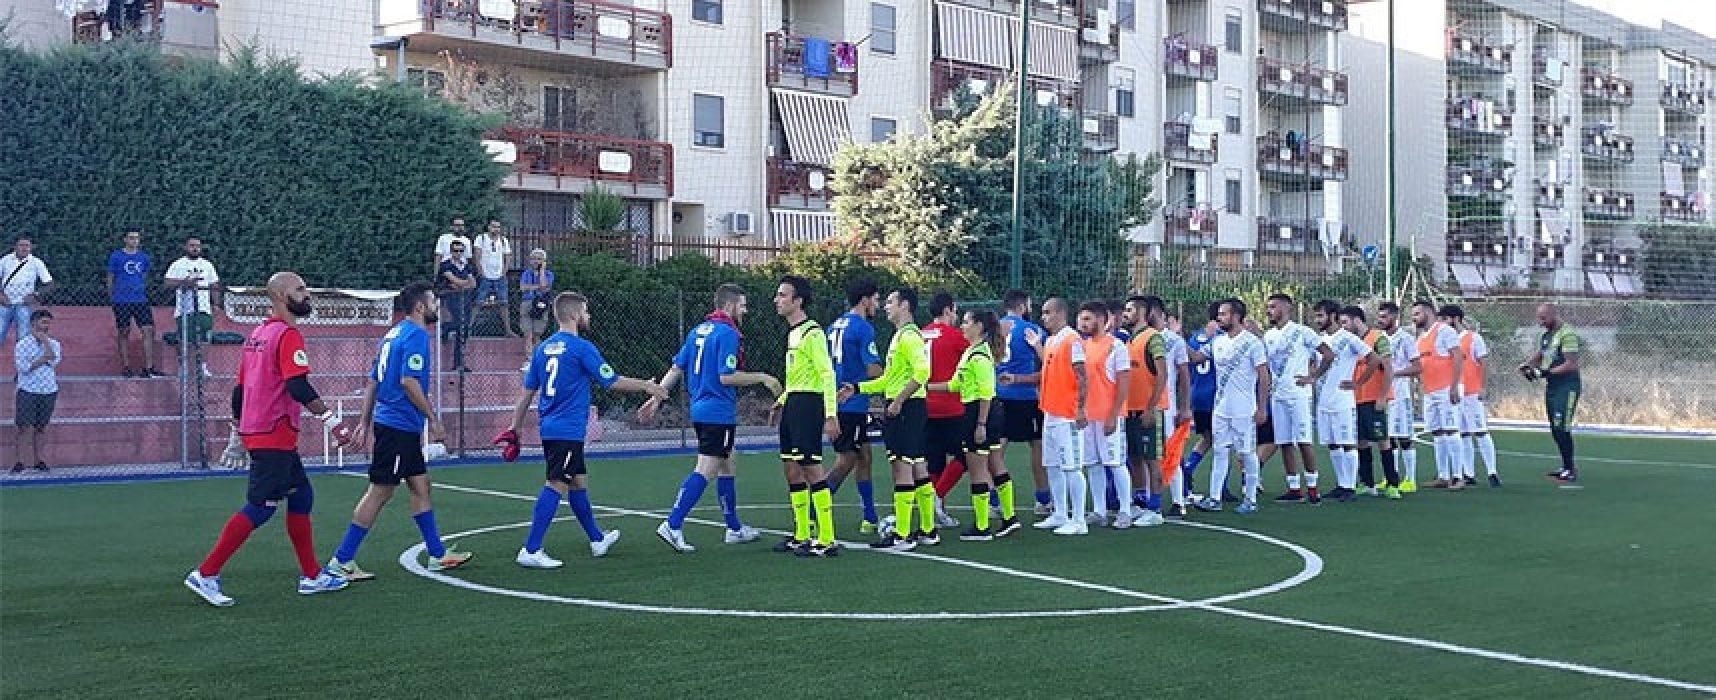 Futbol Cinco, ko in rimonta contro l'Aradeo